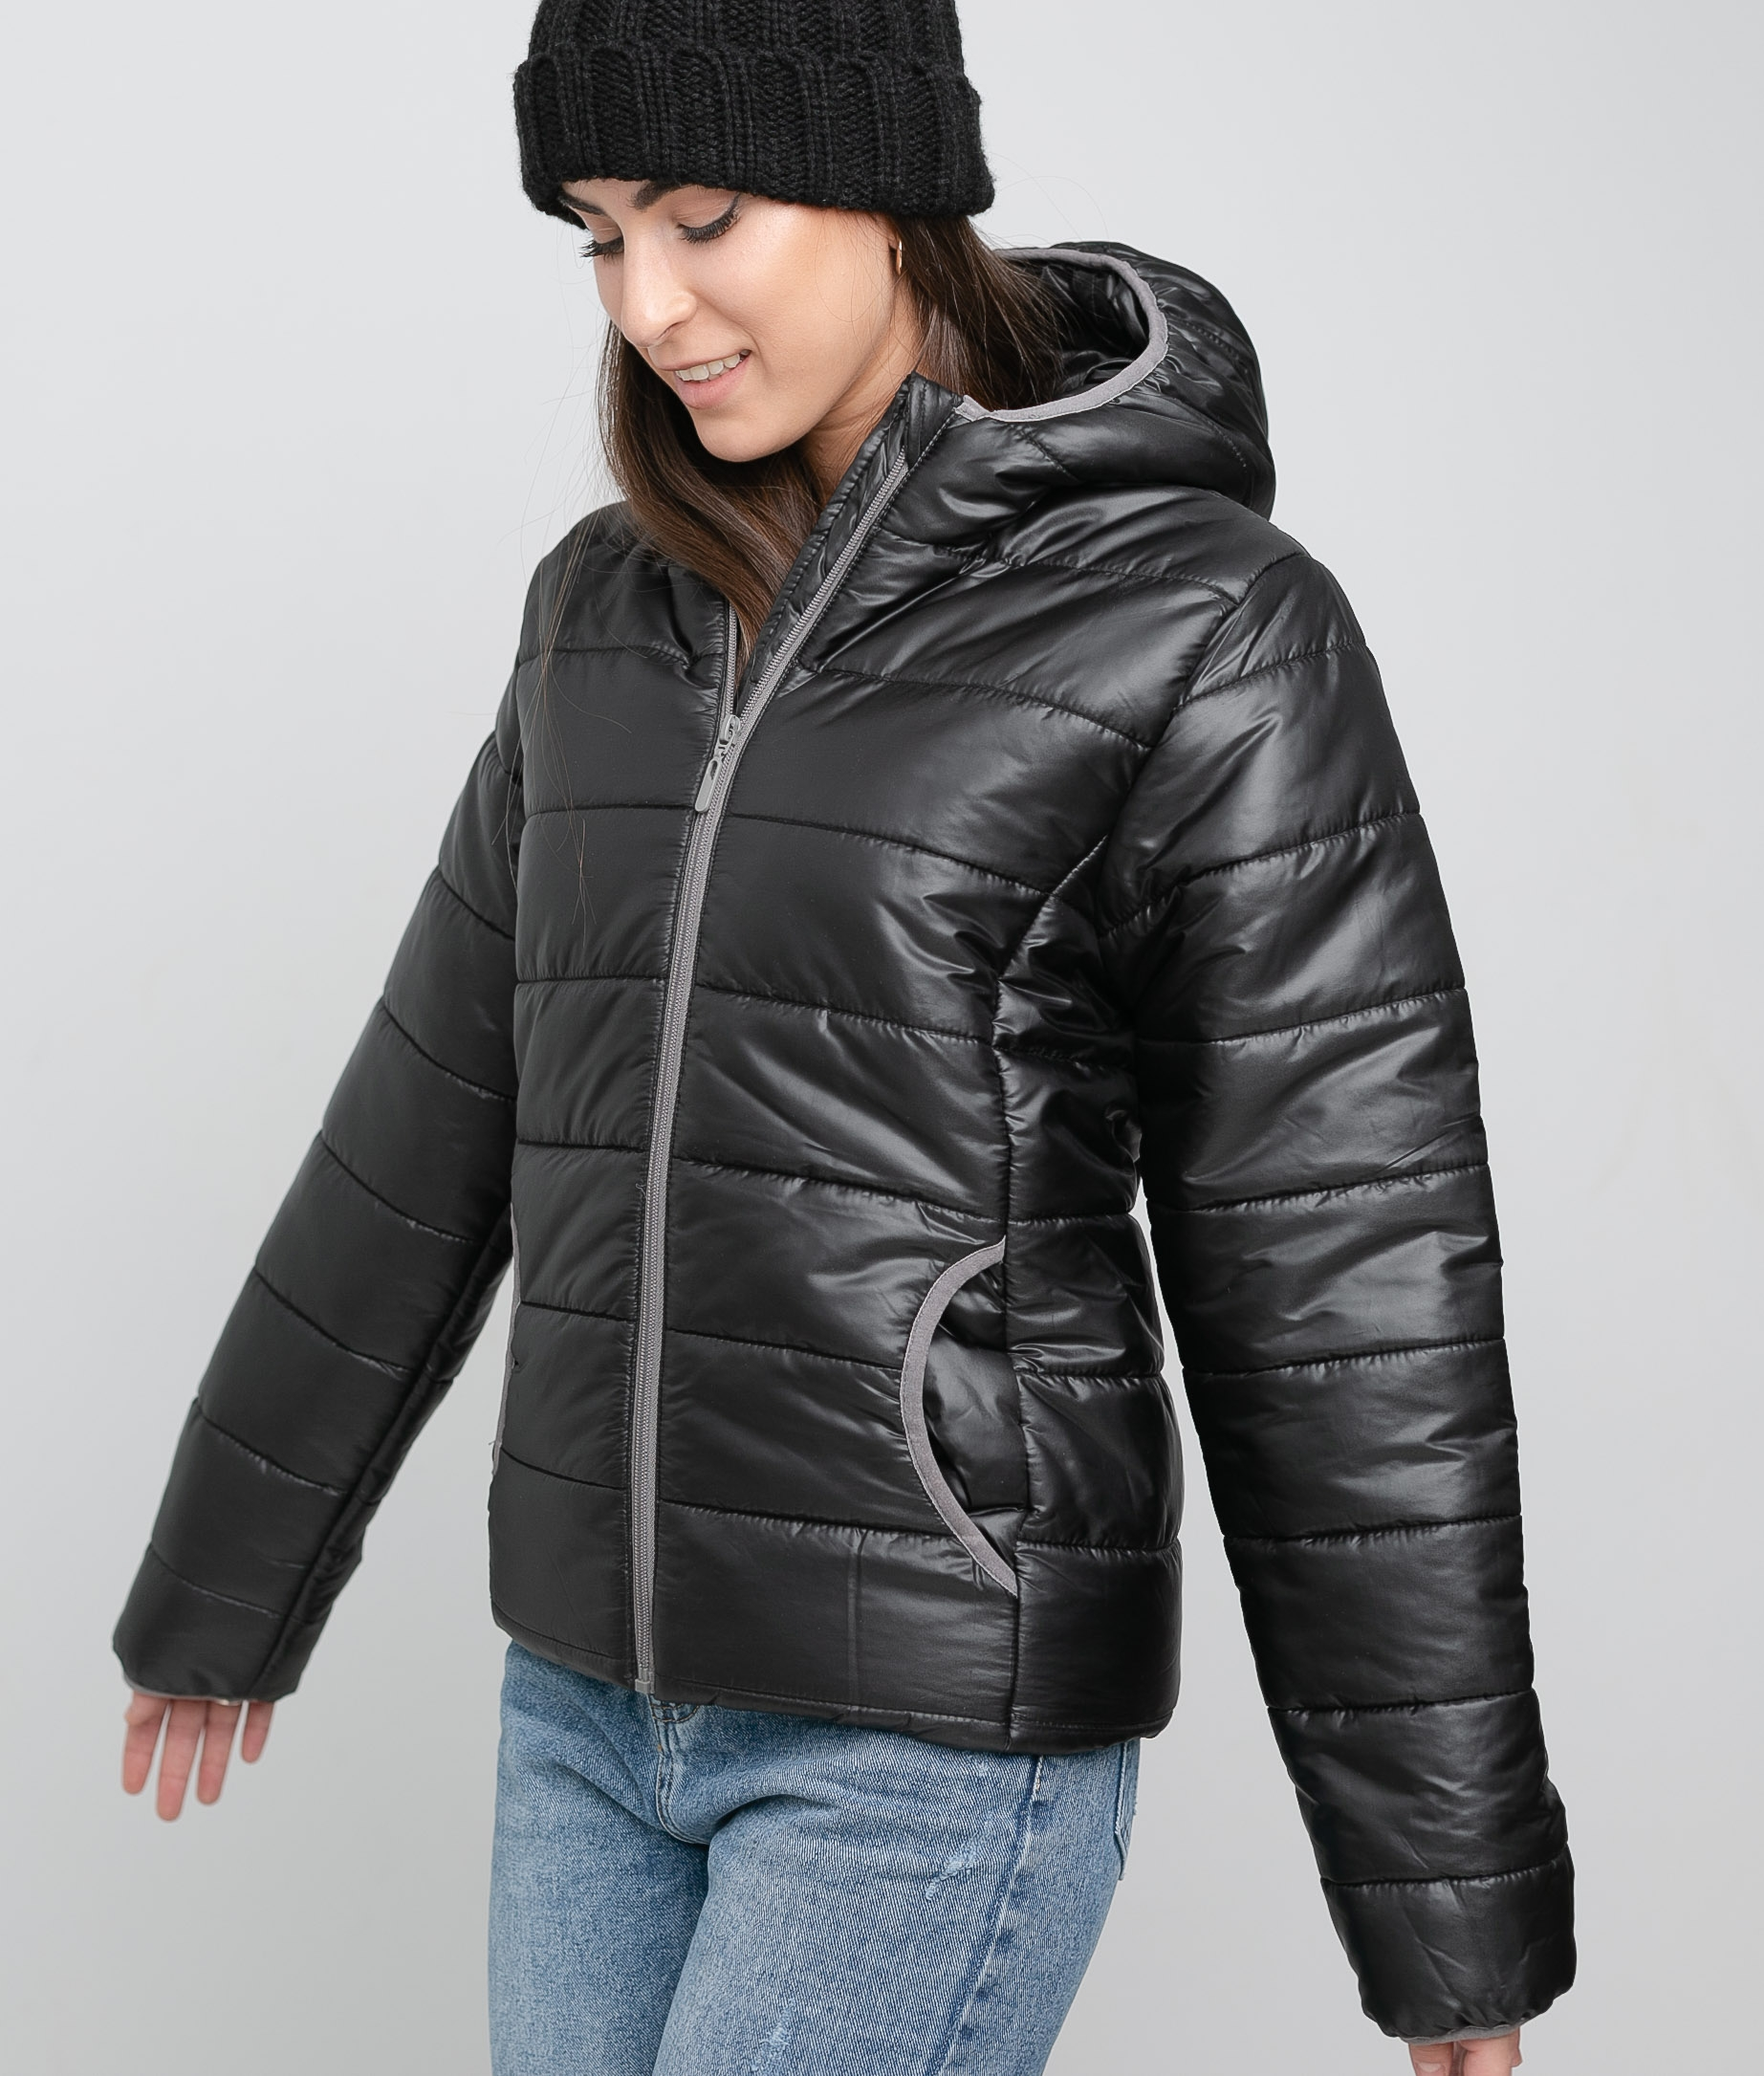 Jacket Norax - Black